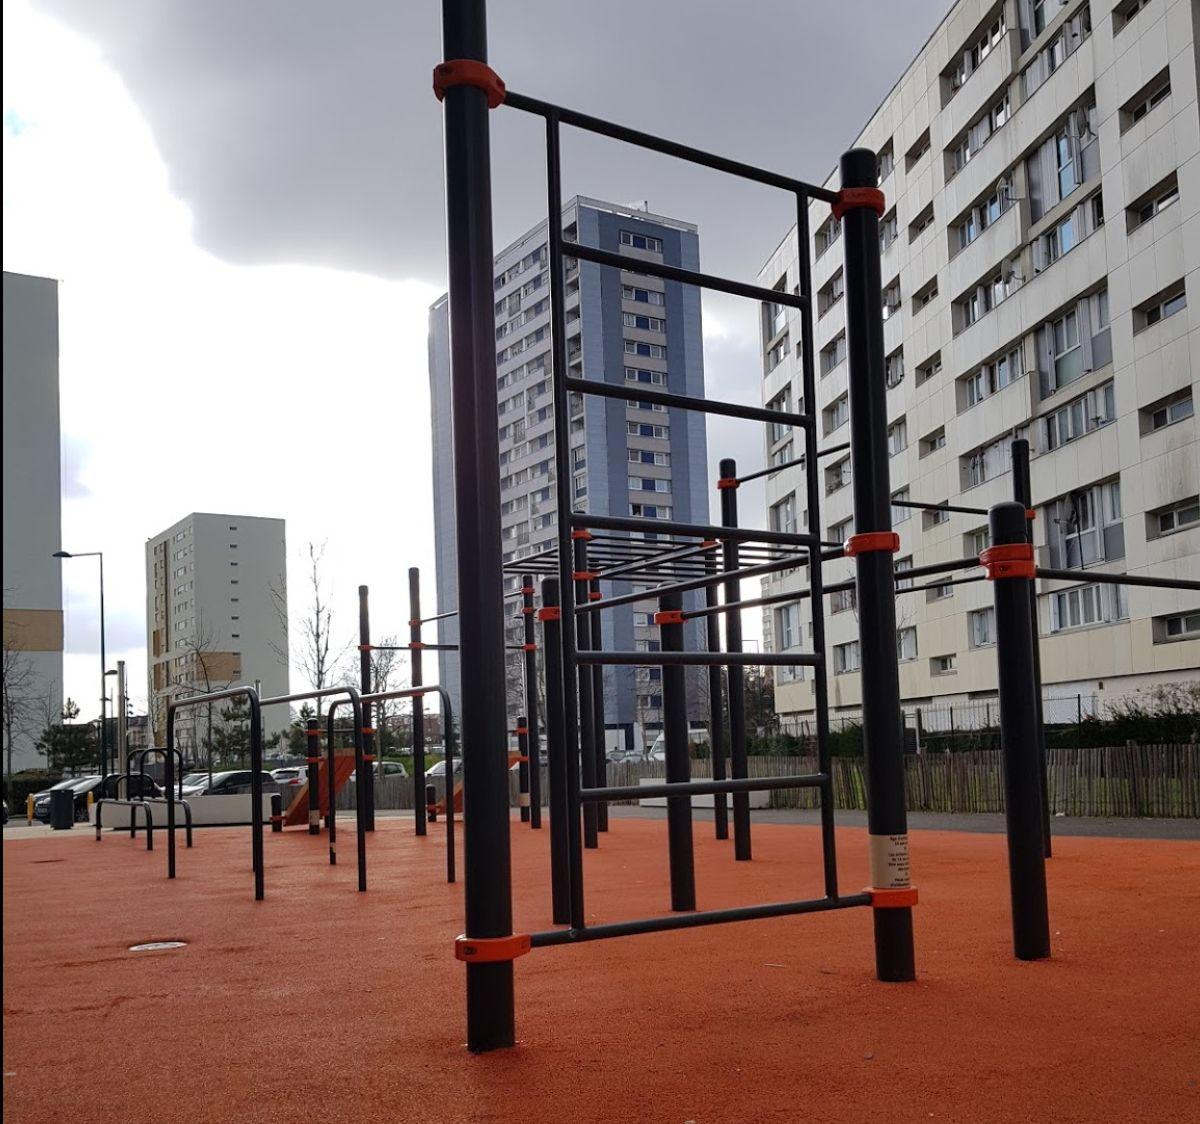 Saint-Denis - Street Workout Gym - Rue Romain Rolland